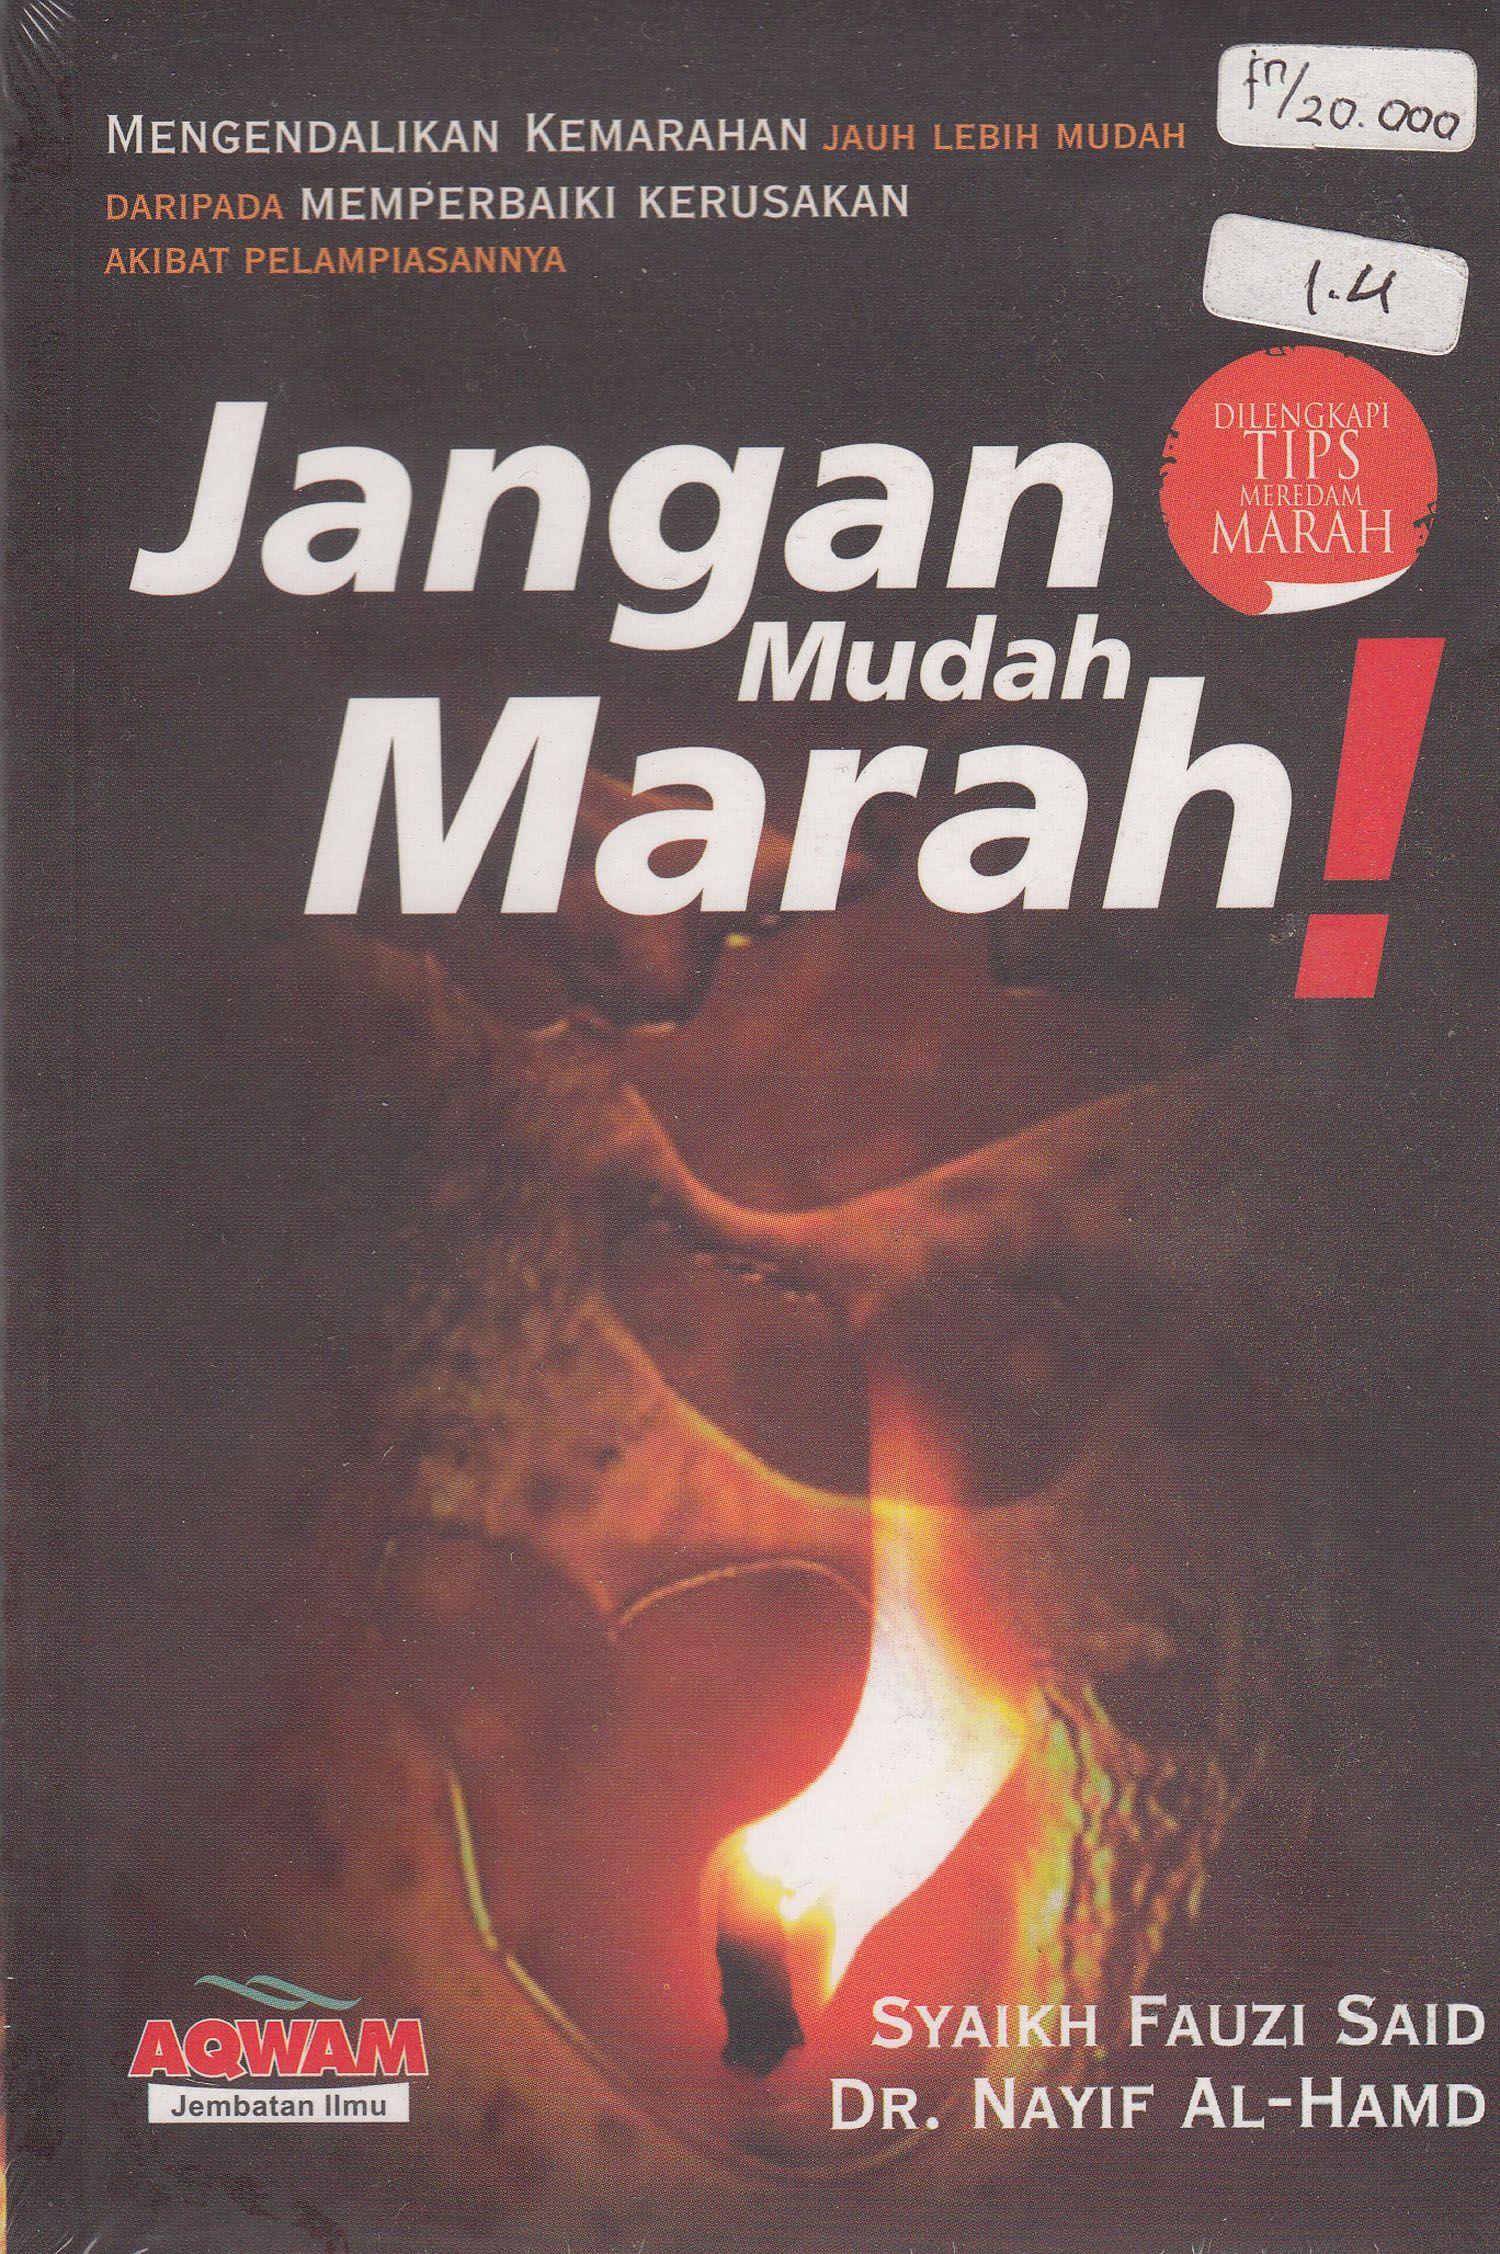 Sejatinya Marah Tidak Bisa Dilepaskan Dari Peran Serta Setan Menurut Imam Ibnu Qayyim Al Jauziyyah Selain Hawa Nafsu Marah Merupakan Hawa Nafsu Marah Buku